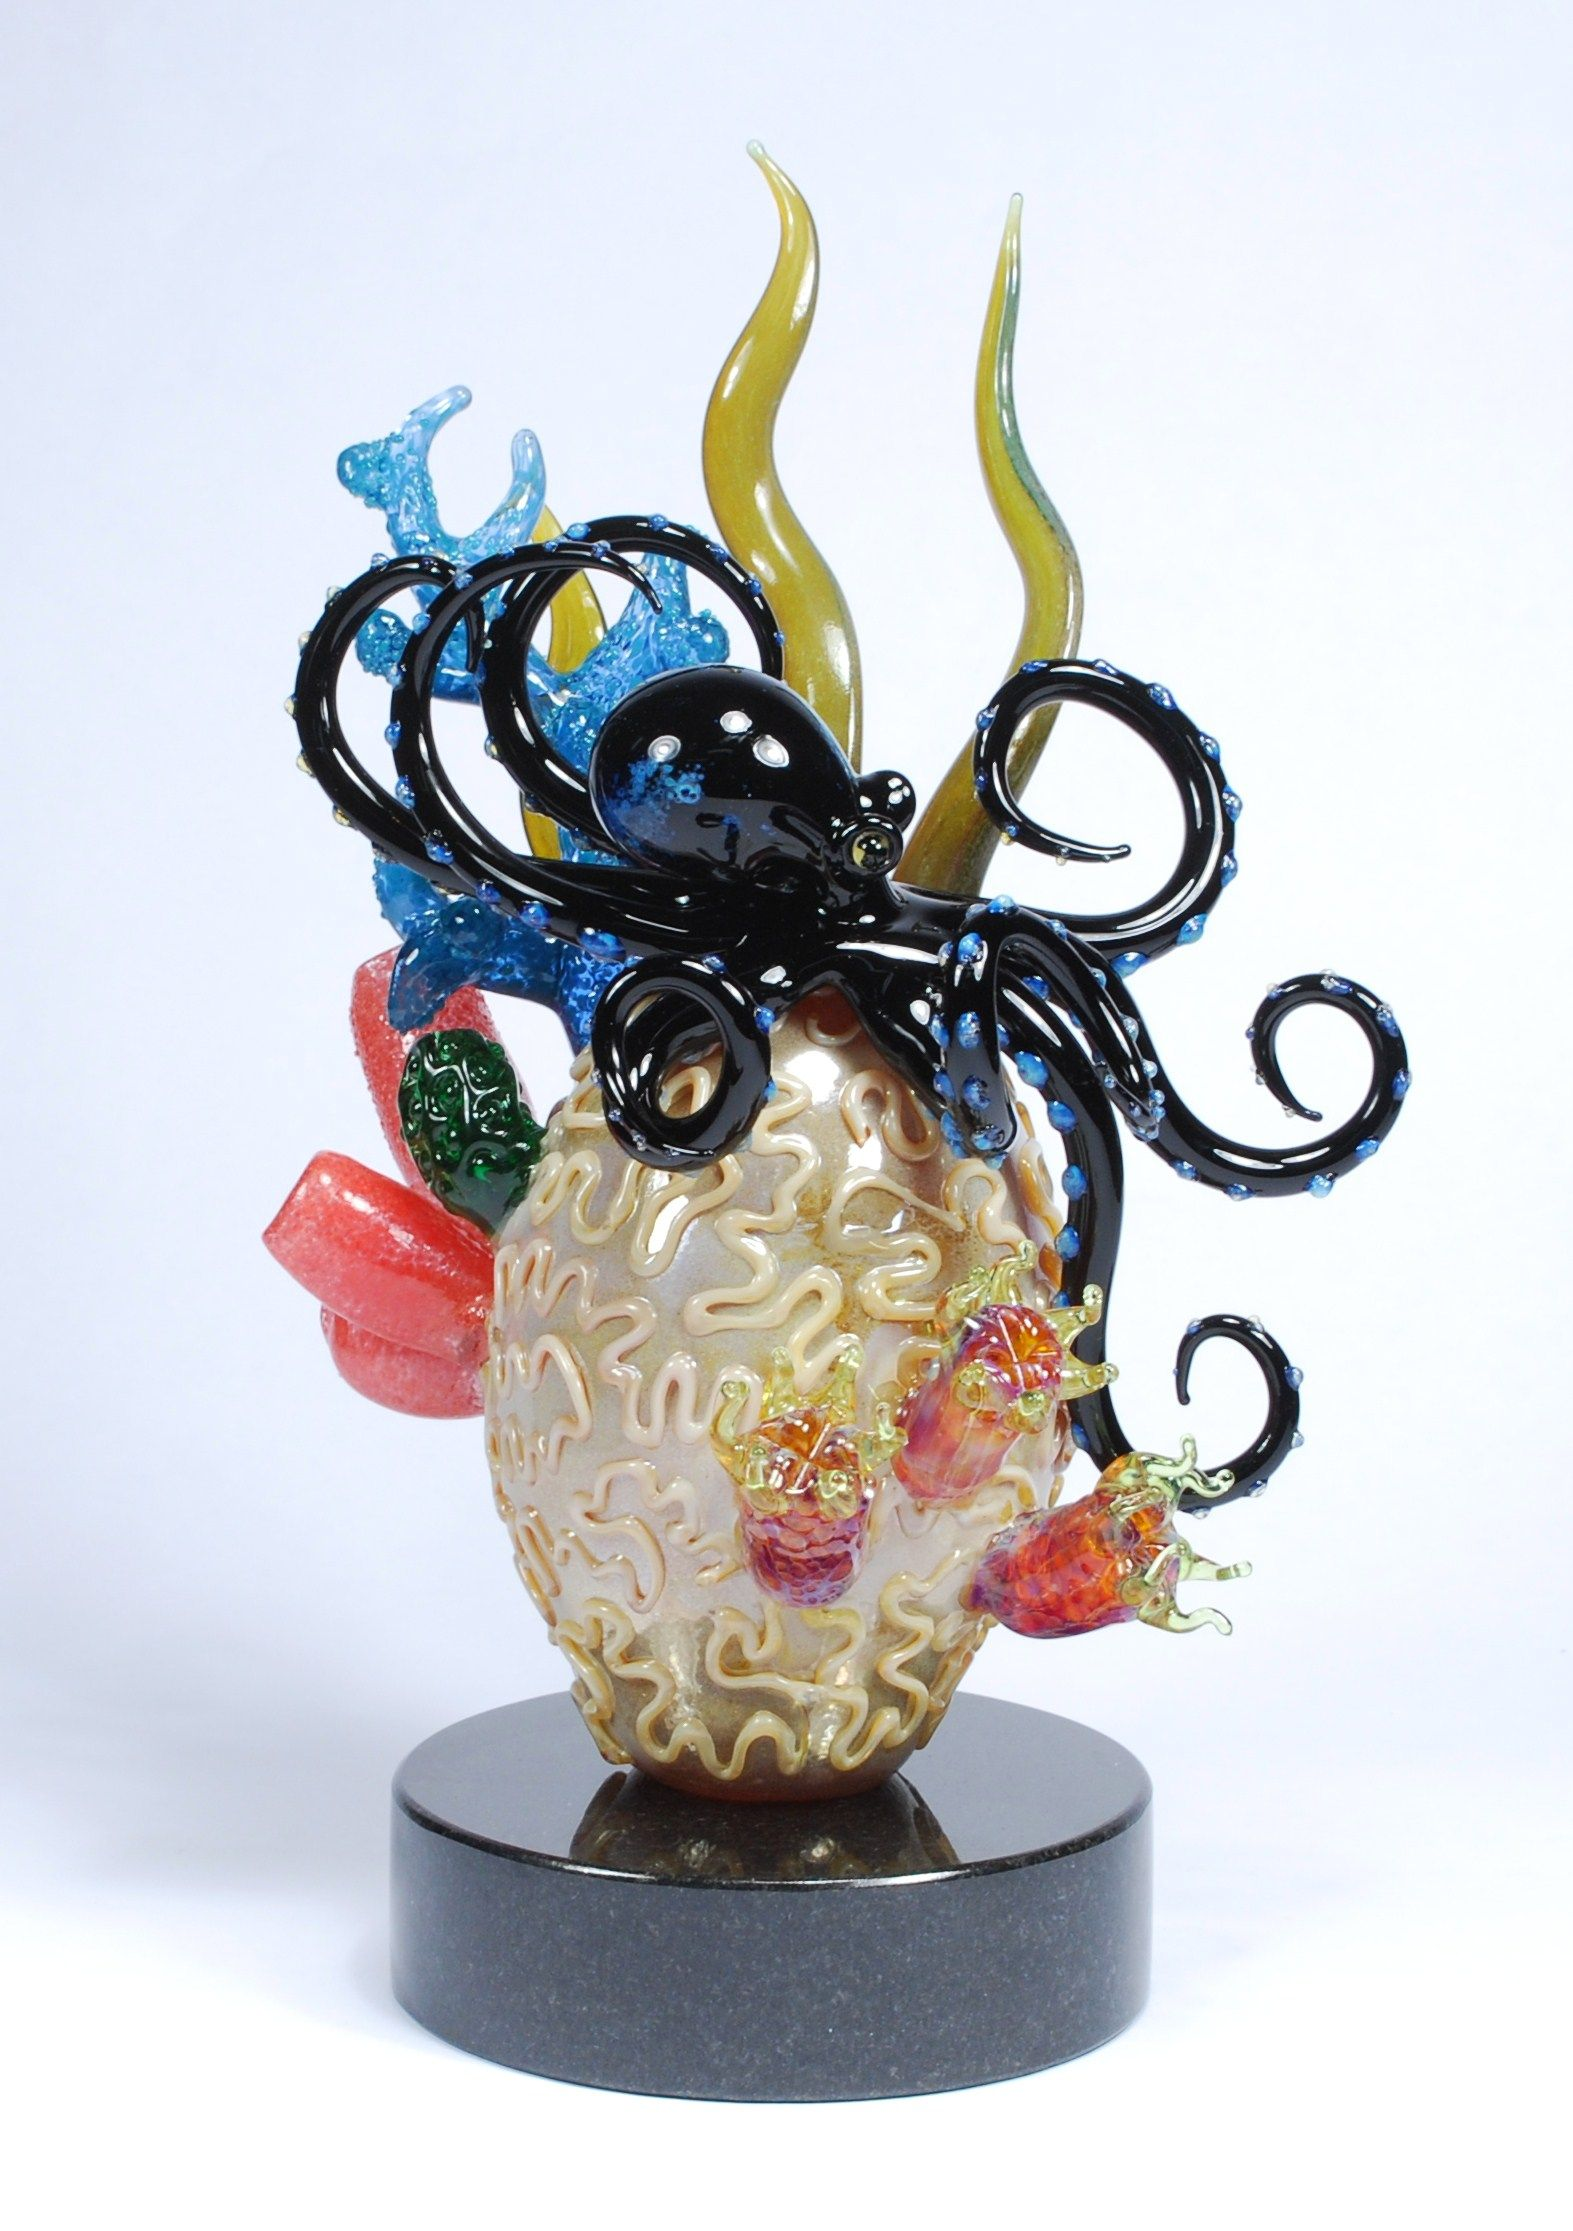 Marvelous Jeremy Sinkus Brainy Octopus